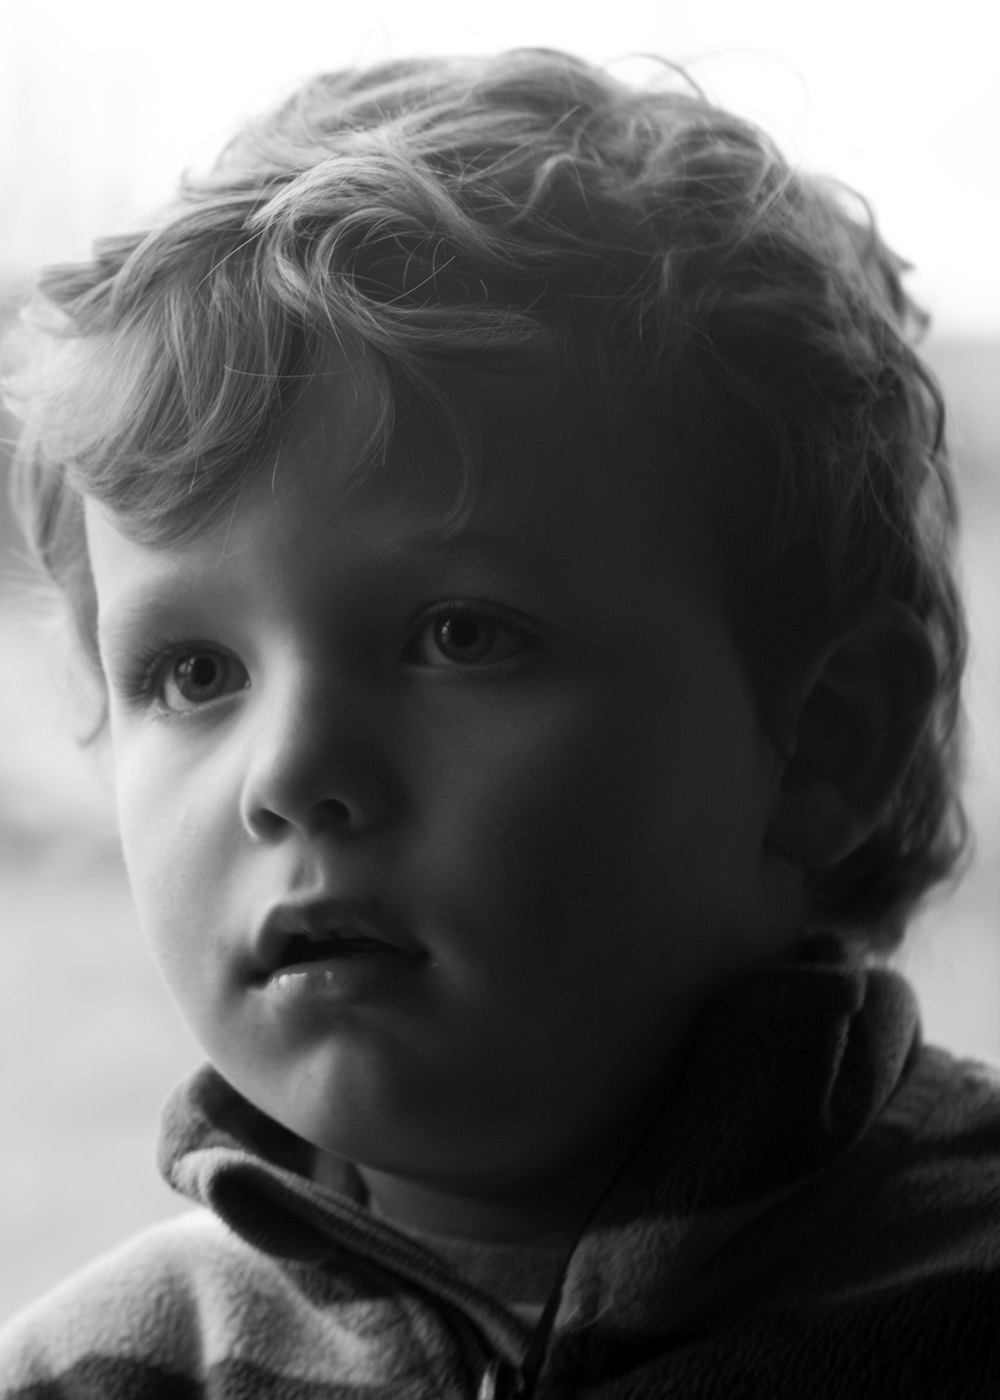 8 - Human portraiture - Maire Corbett.jpg